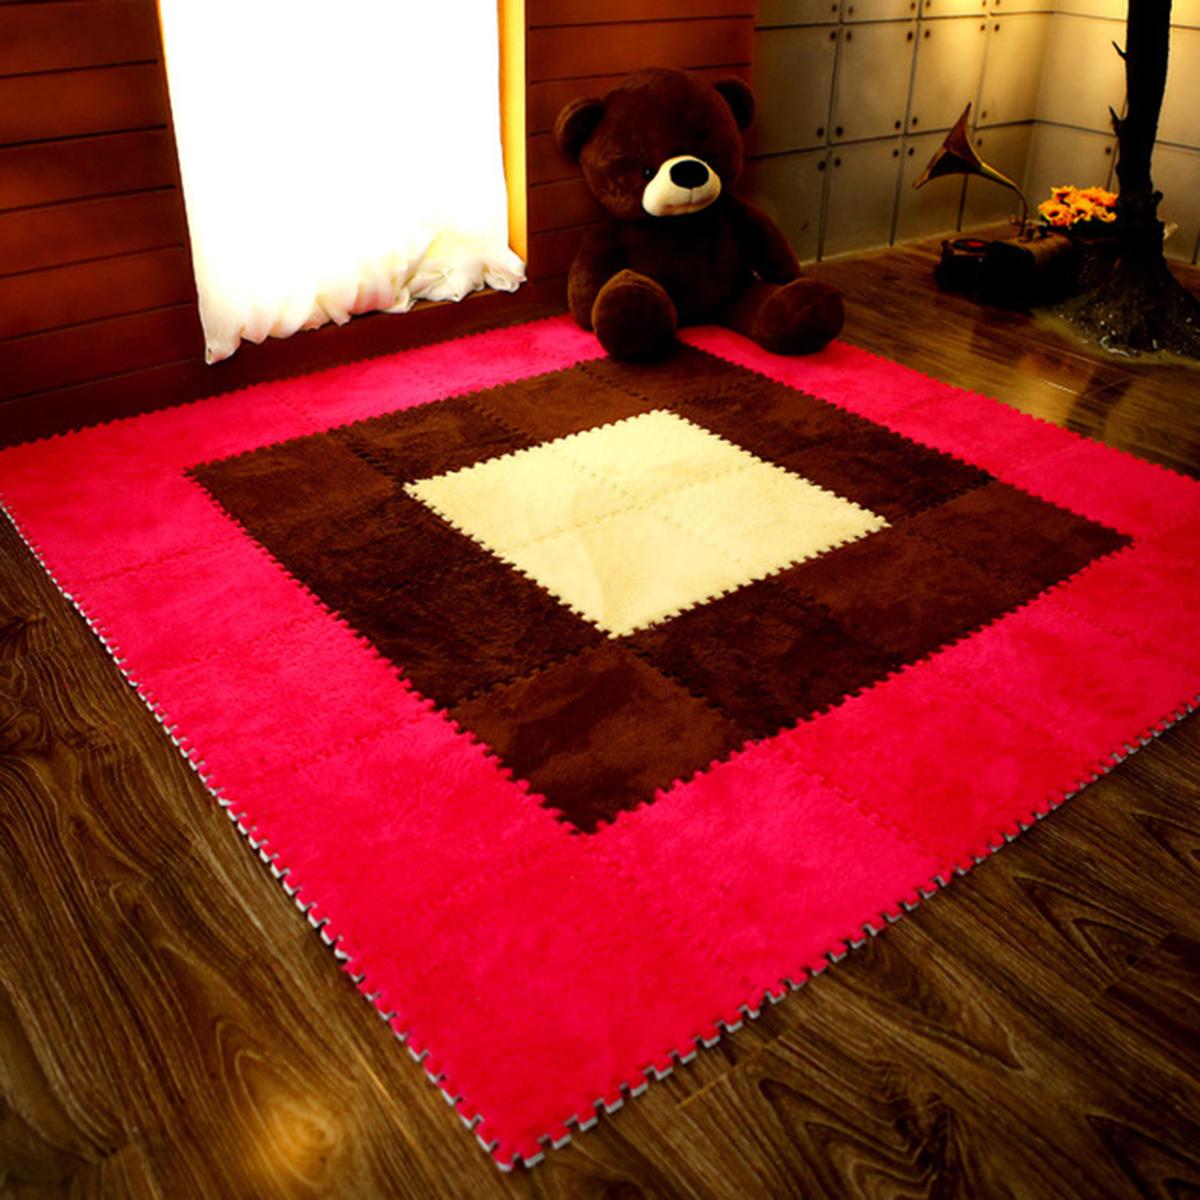 Meddler 31cm Baby Crawling Puzzle EVA Foam Soft Mat Kids Play Carpet Home Floor 10 Pieces EDGES